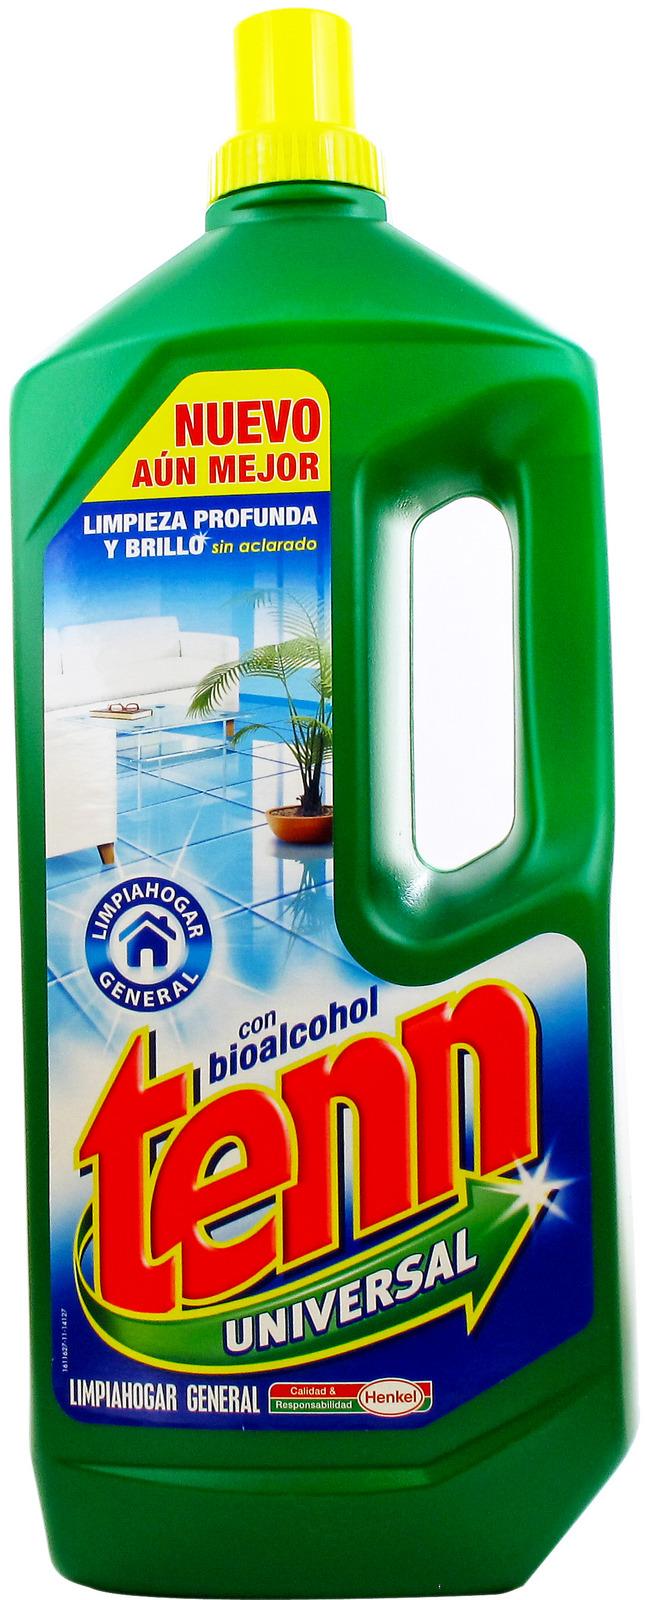 TENN CON BIOALCOHOL 1300 ml.